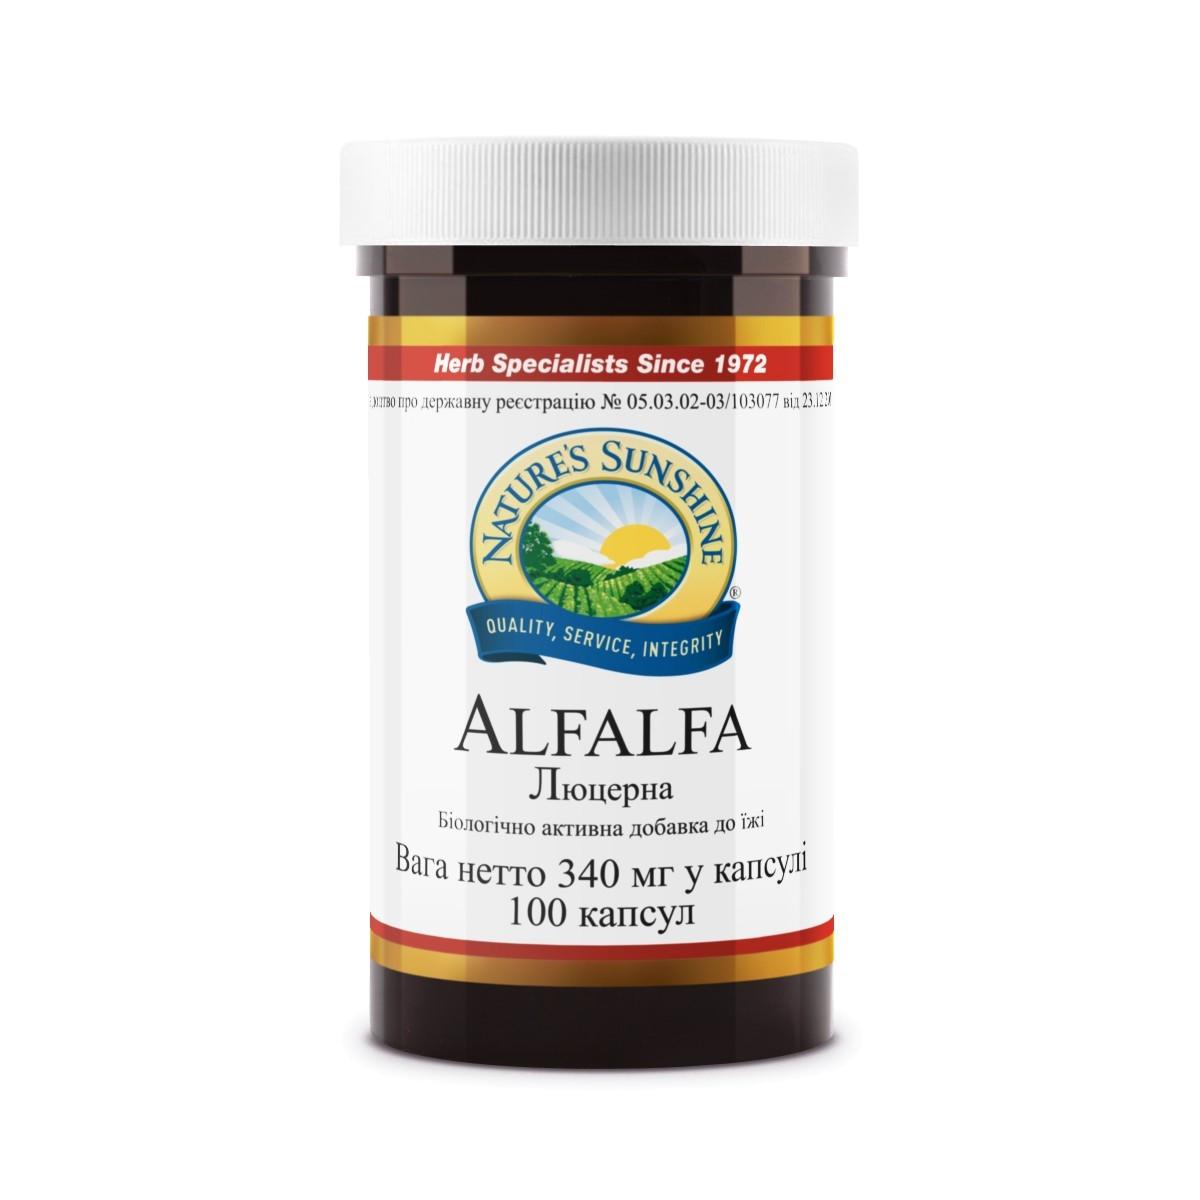 БАД при сахарном диабете - Люцерна  Alfalfa бад НСП люцерна полевая для лактации,